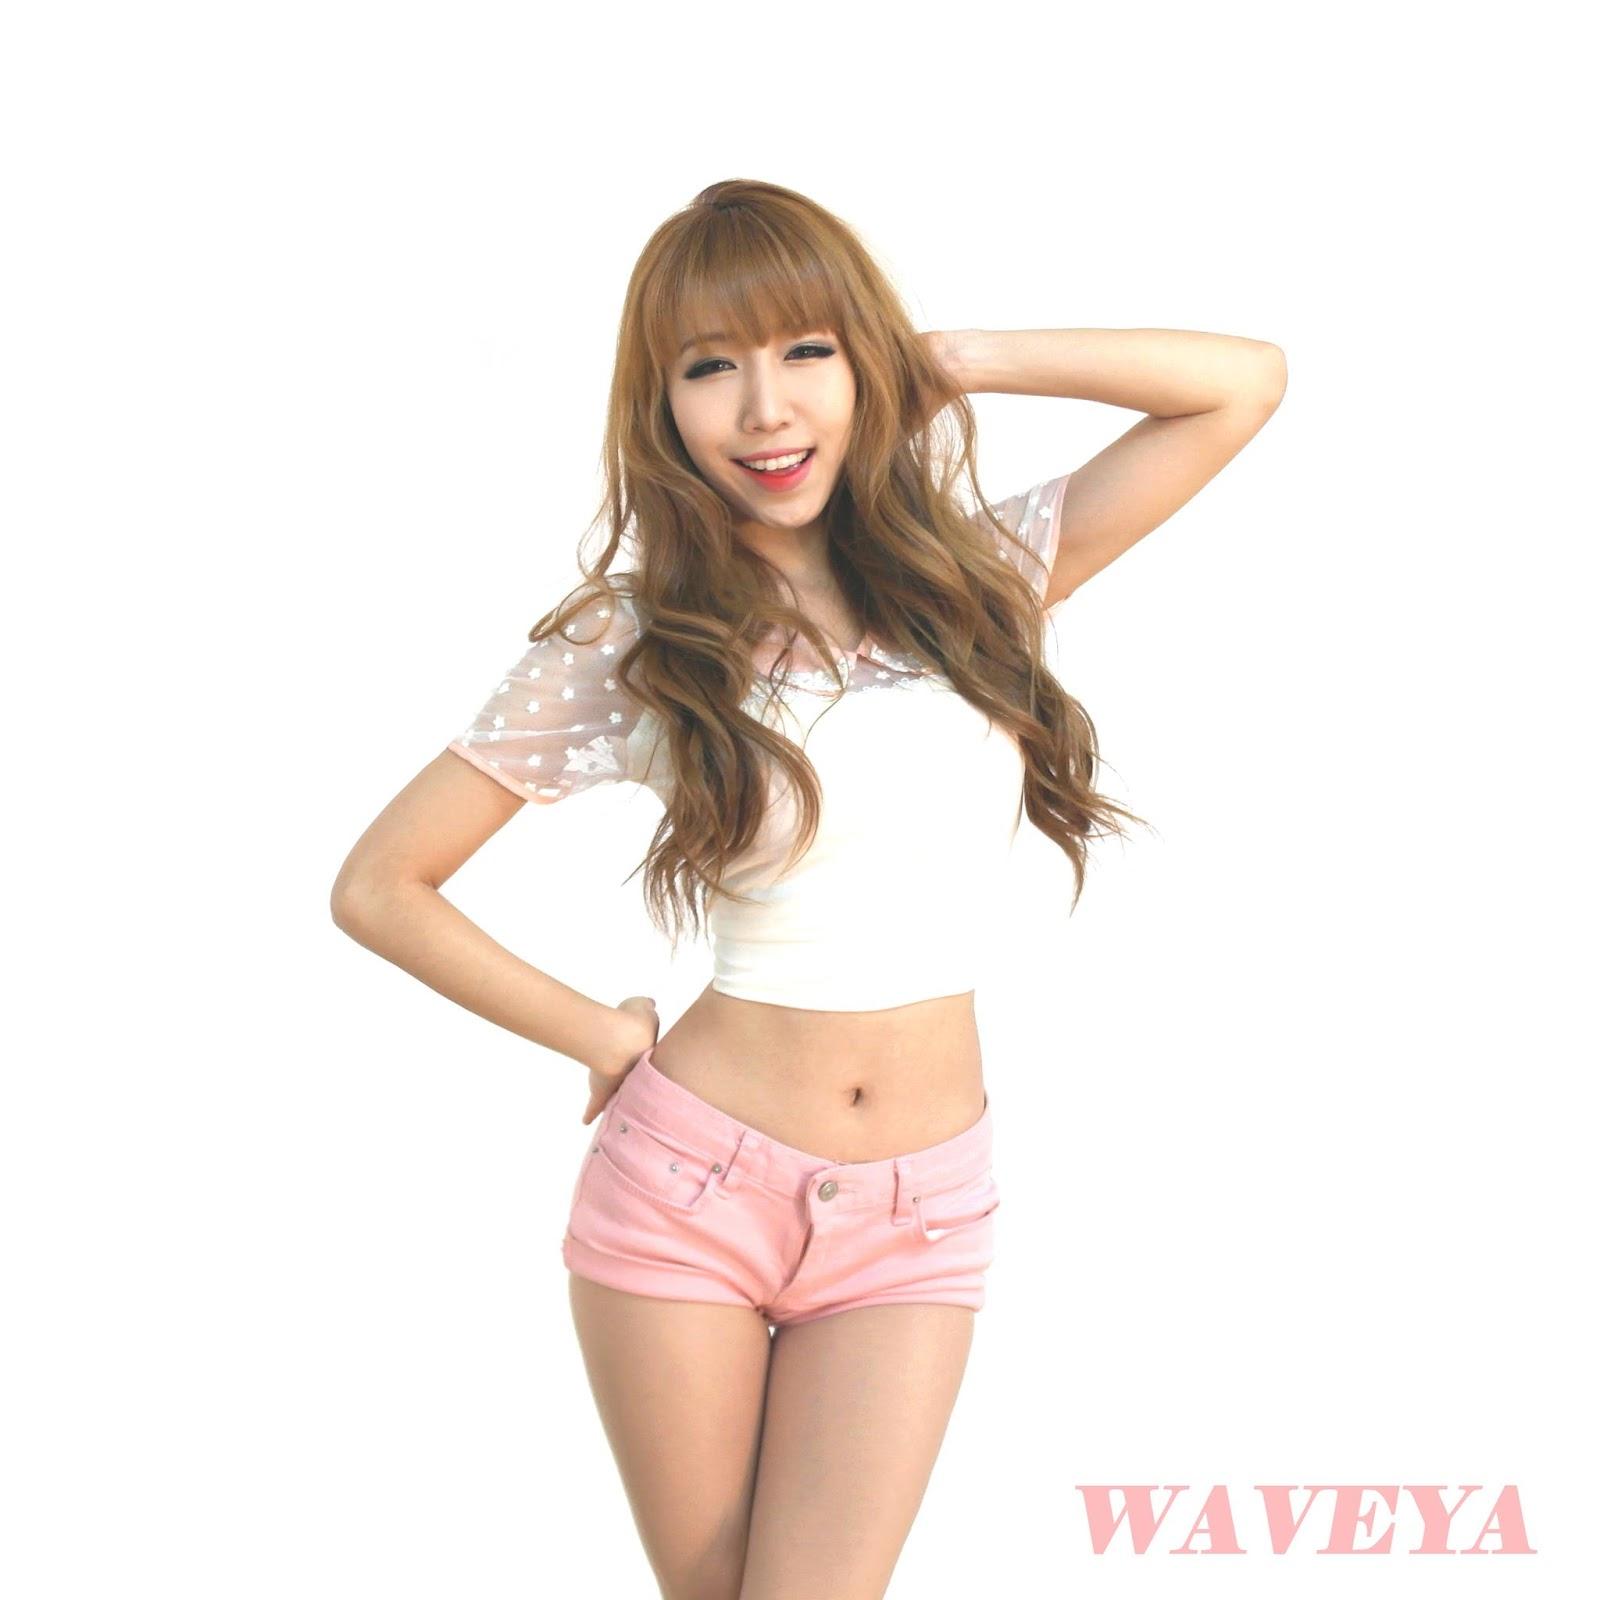 Waveya ari